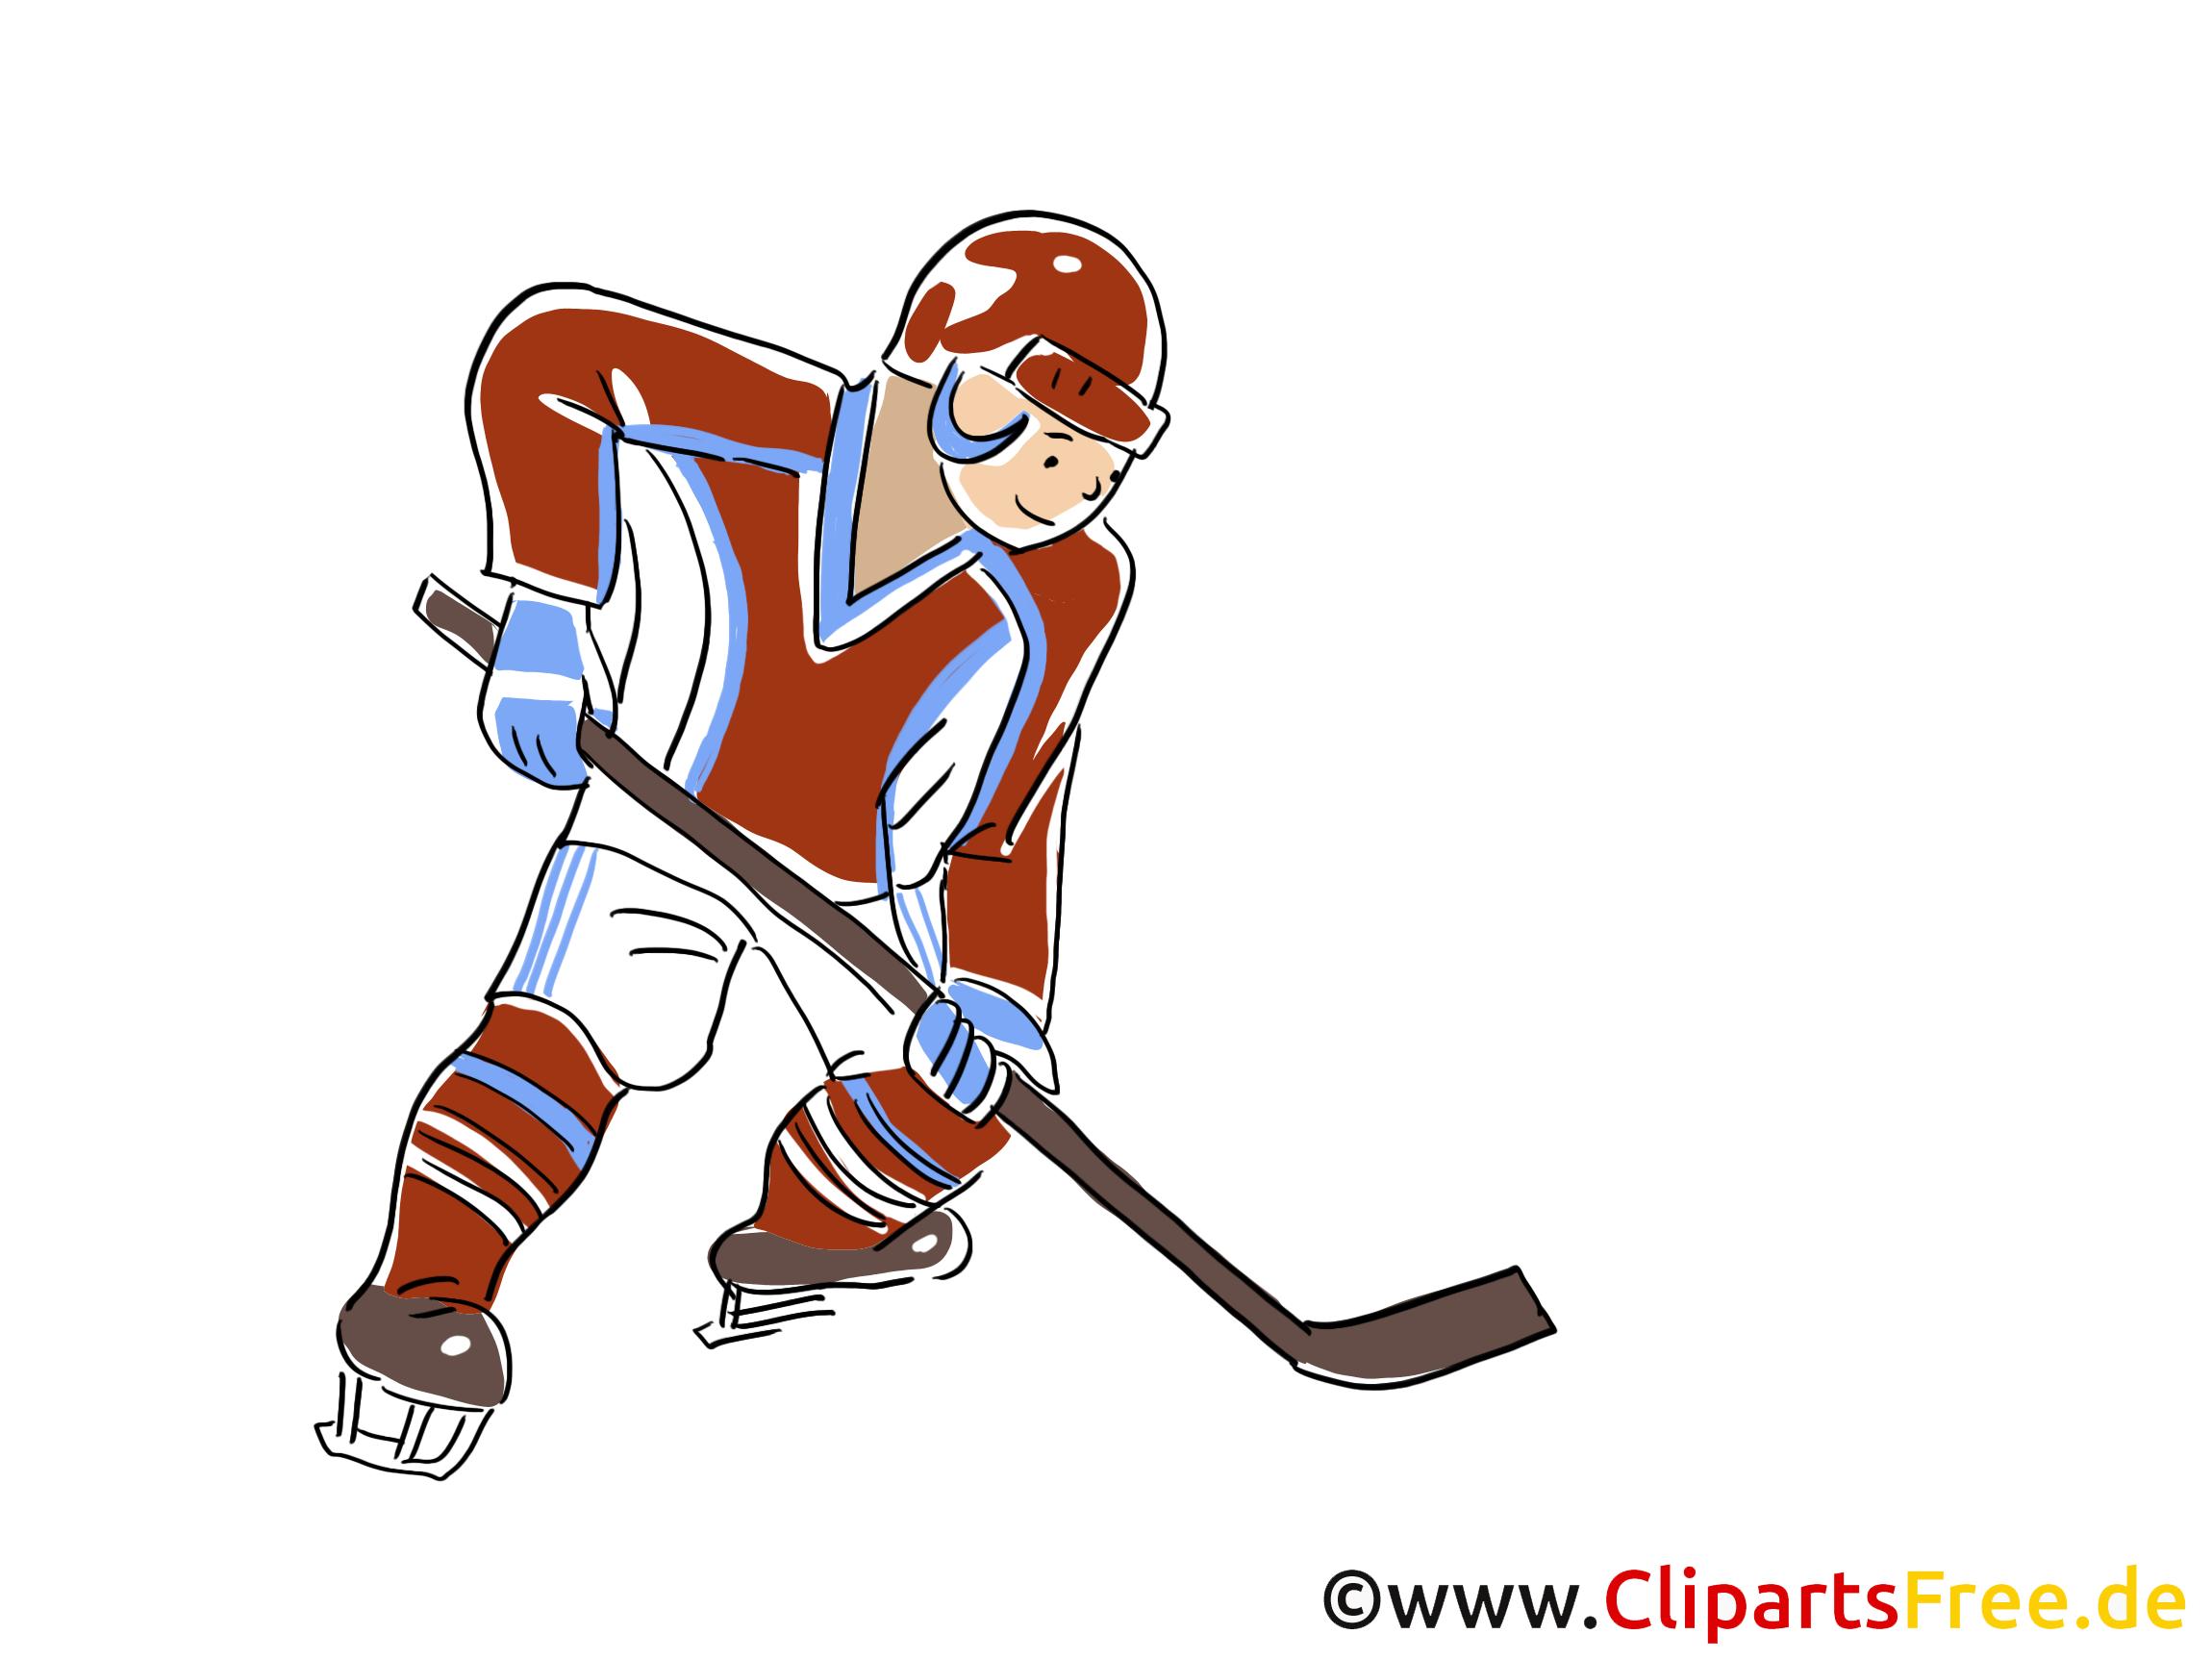 Eishockey Cartoon Hd Wallpaper 4k